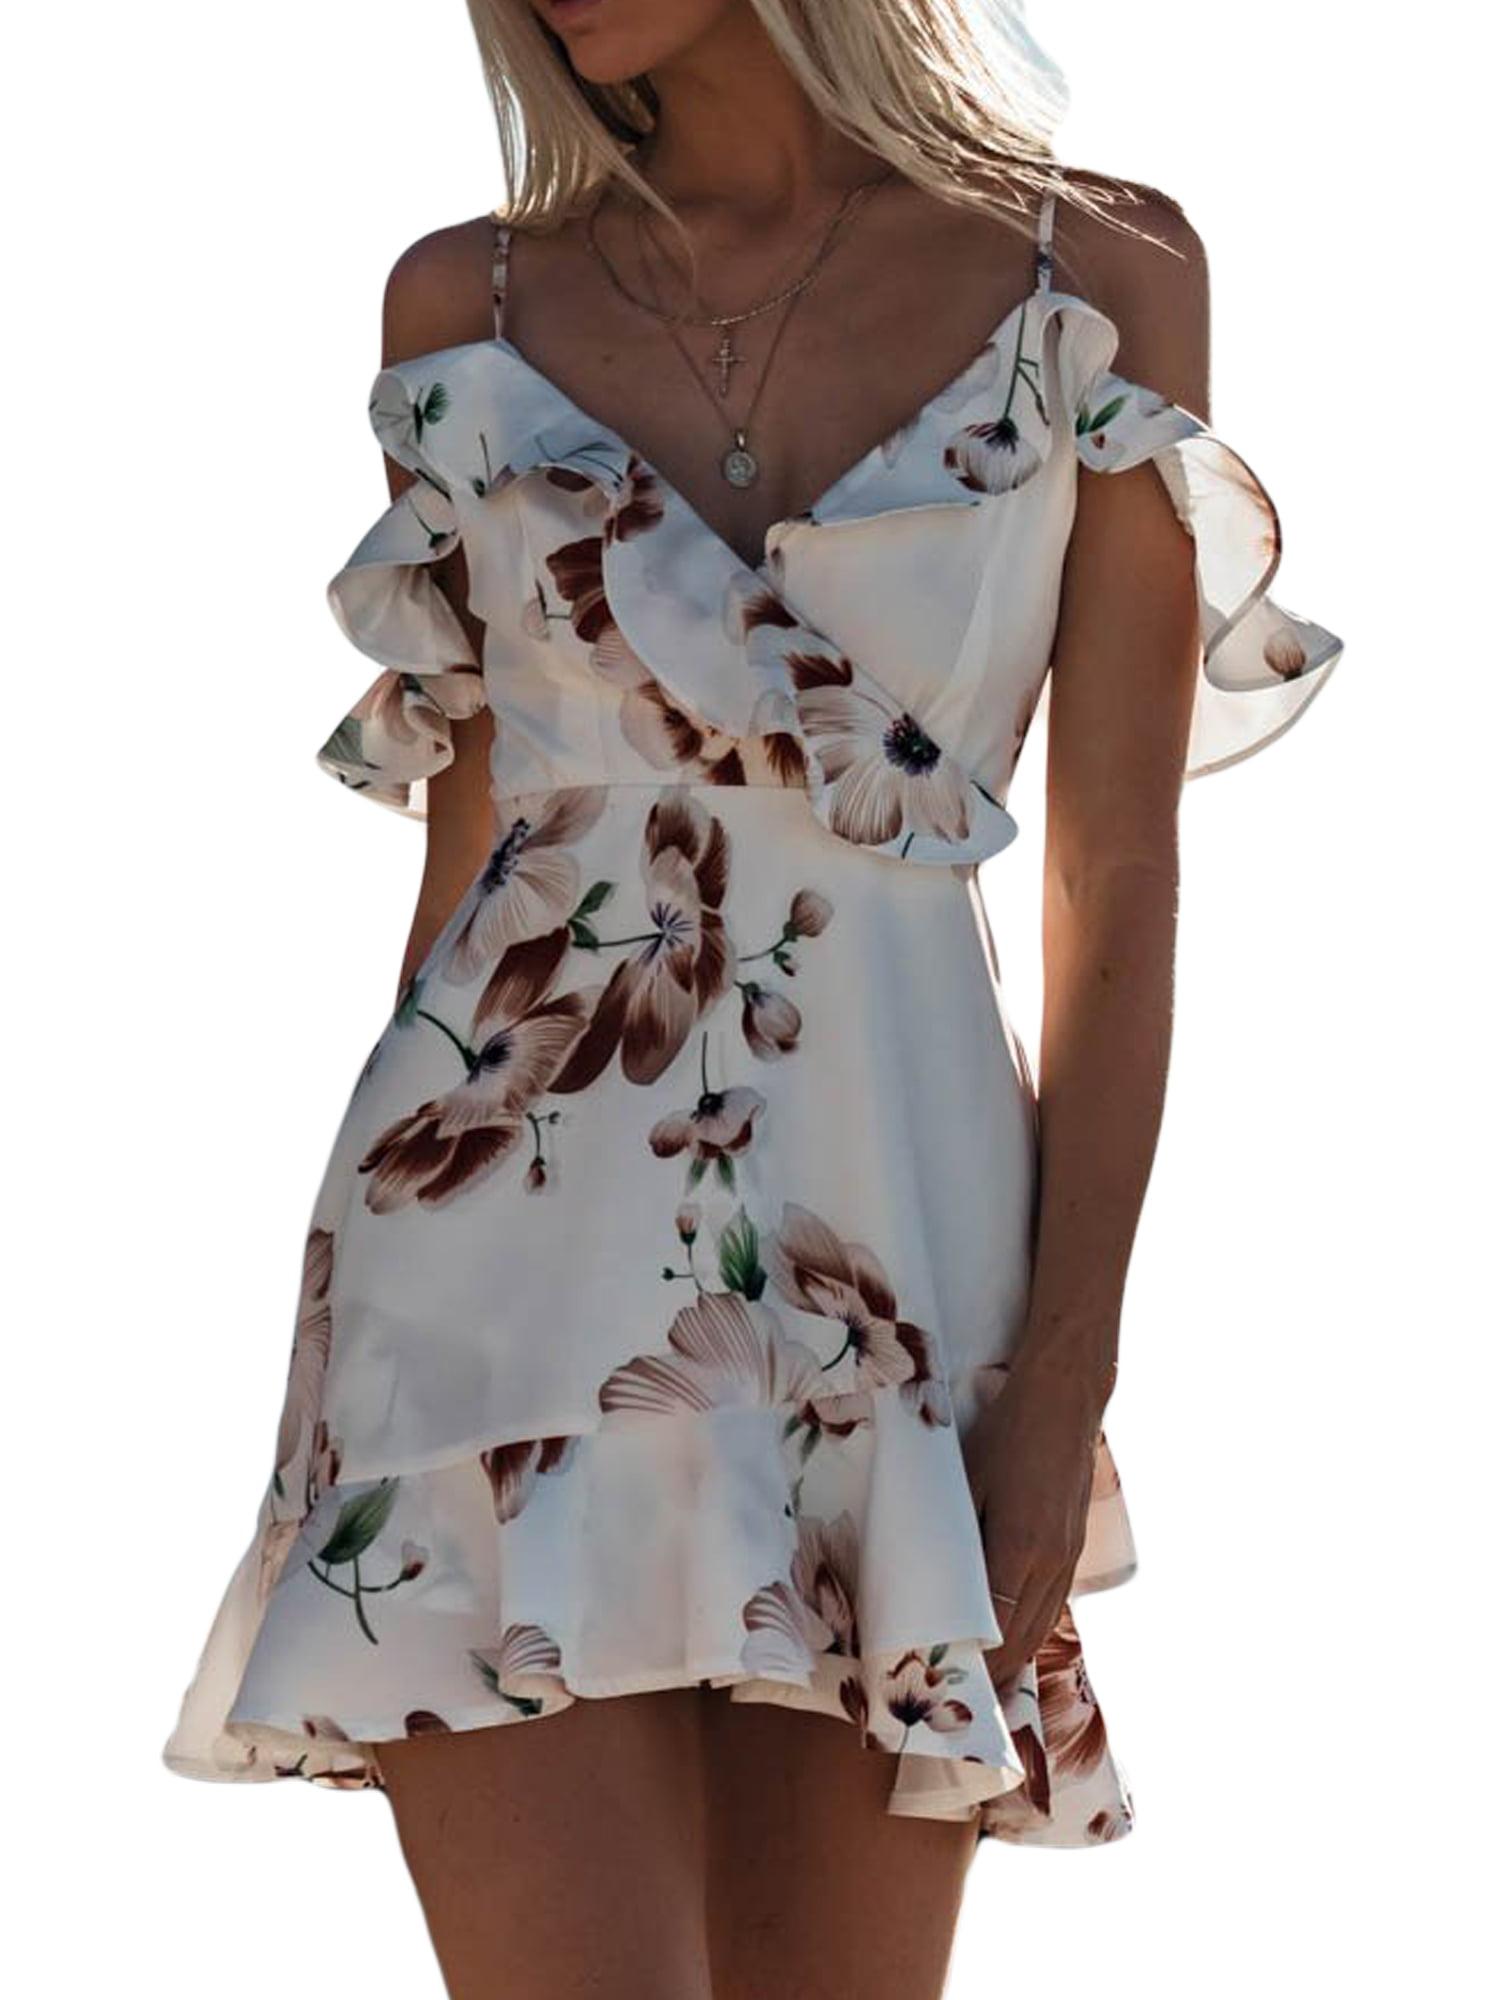 Summer Girls Kids Boho Dress Cold Shoulder Chiffon Beach Party Mini Sundress Hot